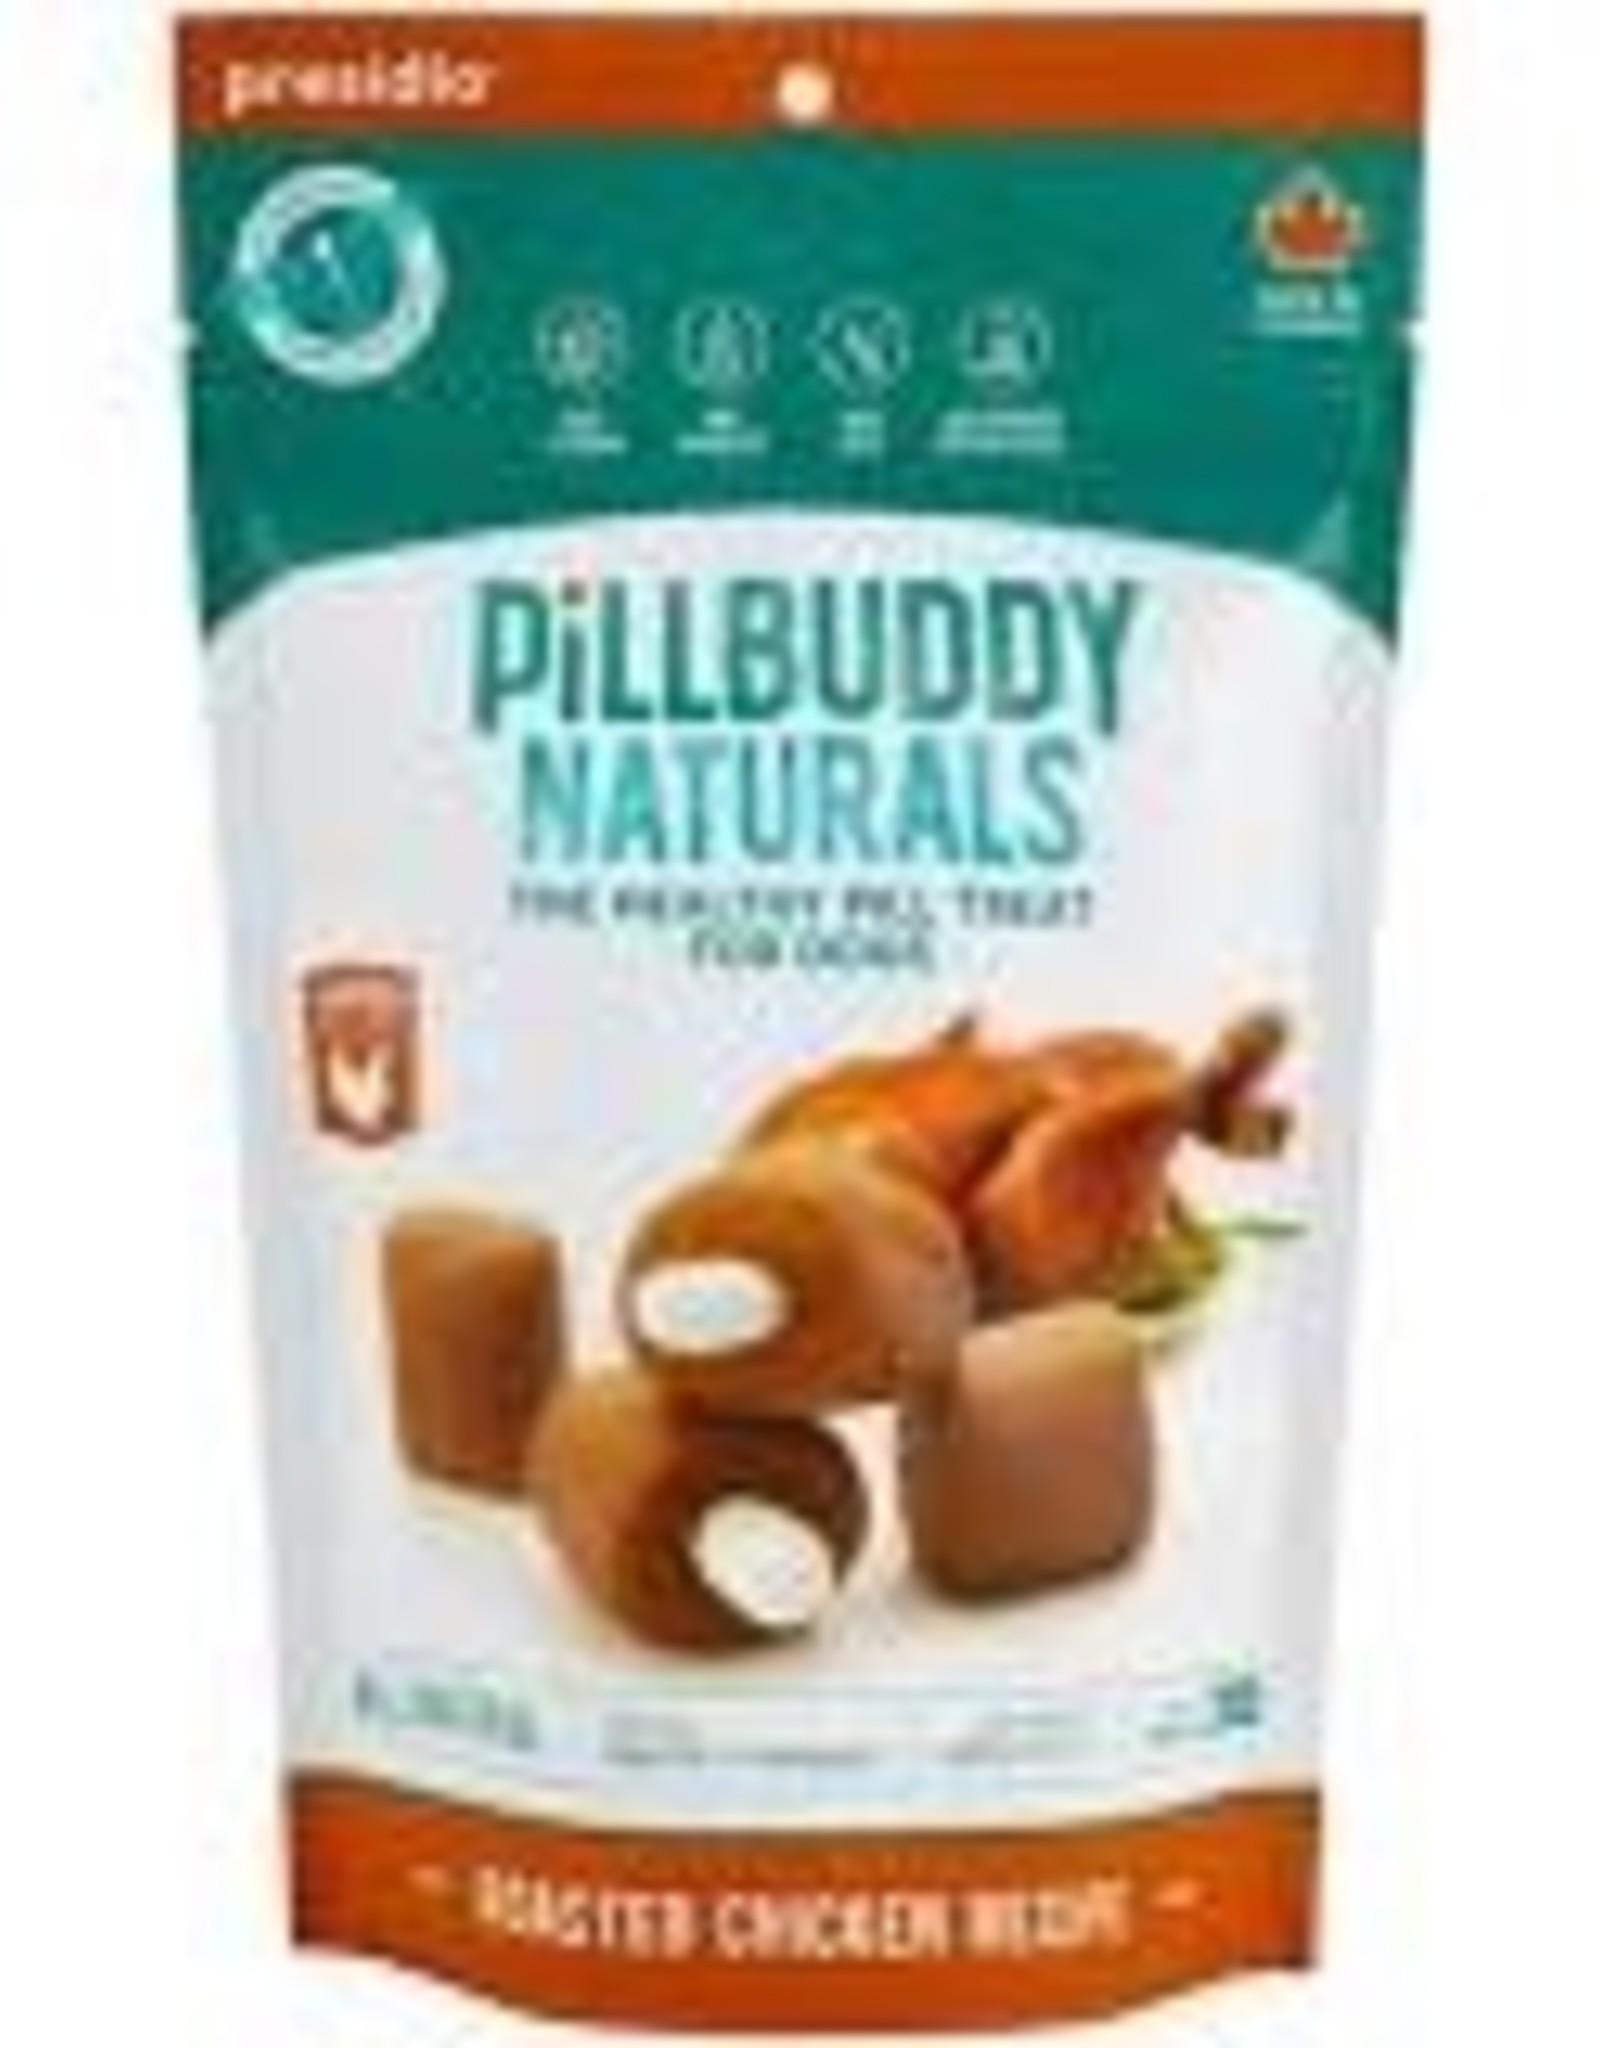 Presidio Natural Pet Co. Pill Buddy Chicken 30ct